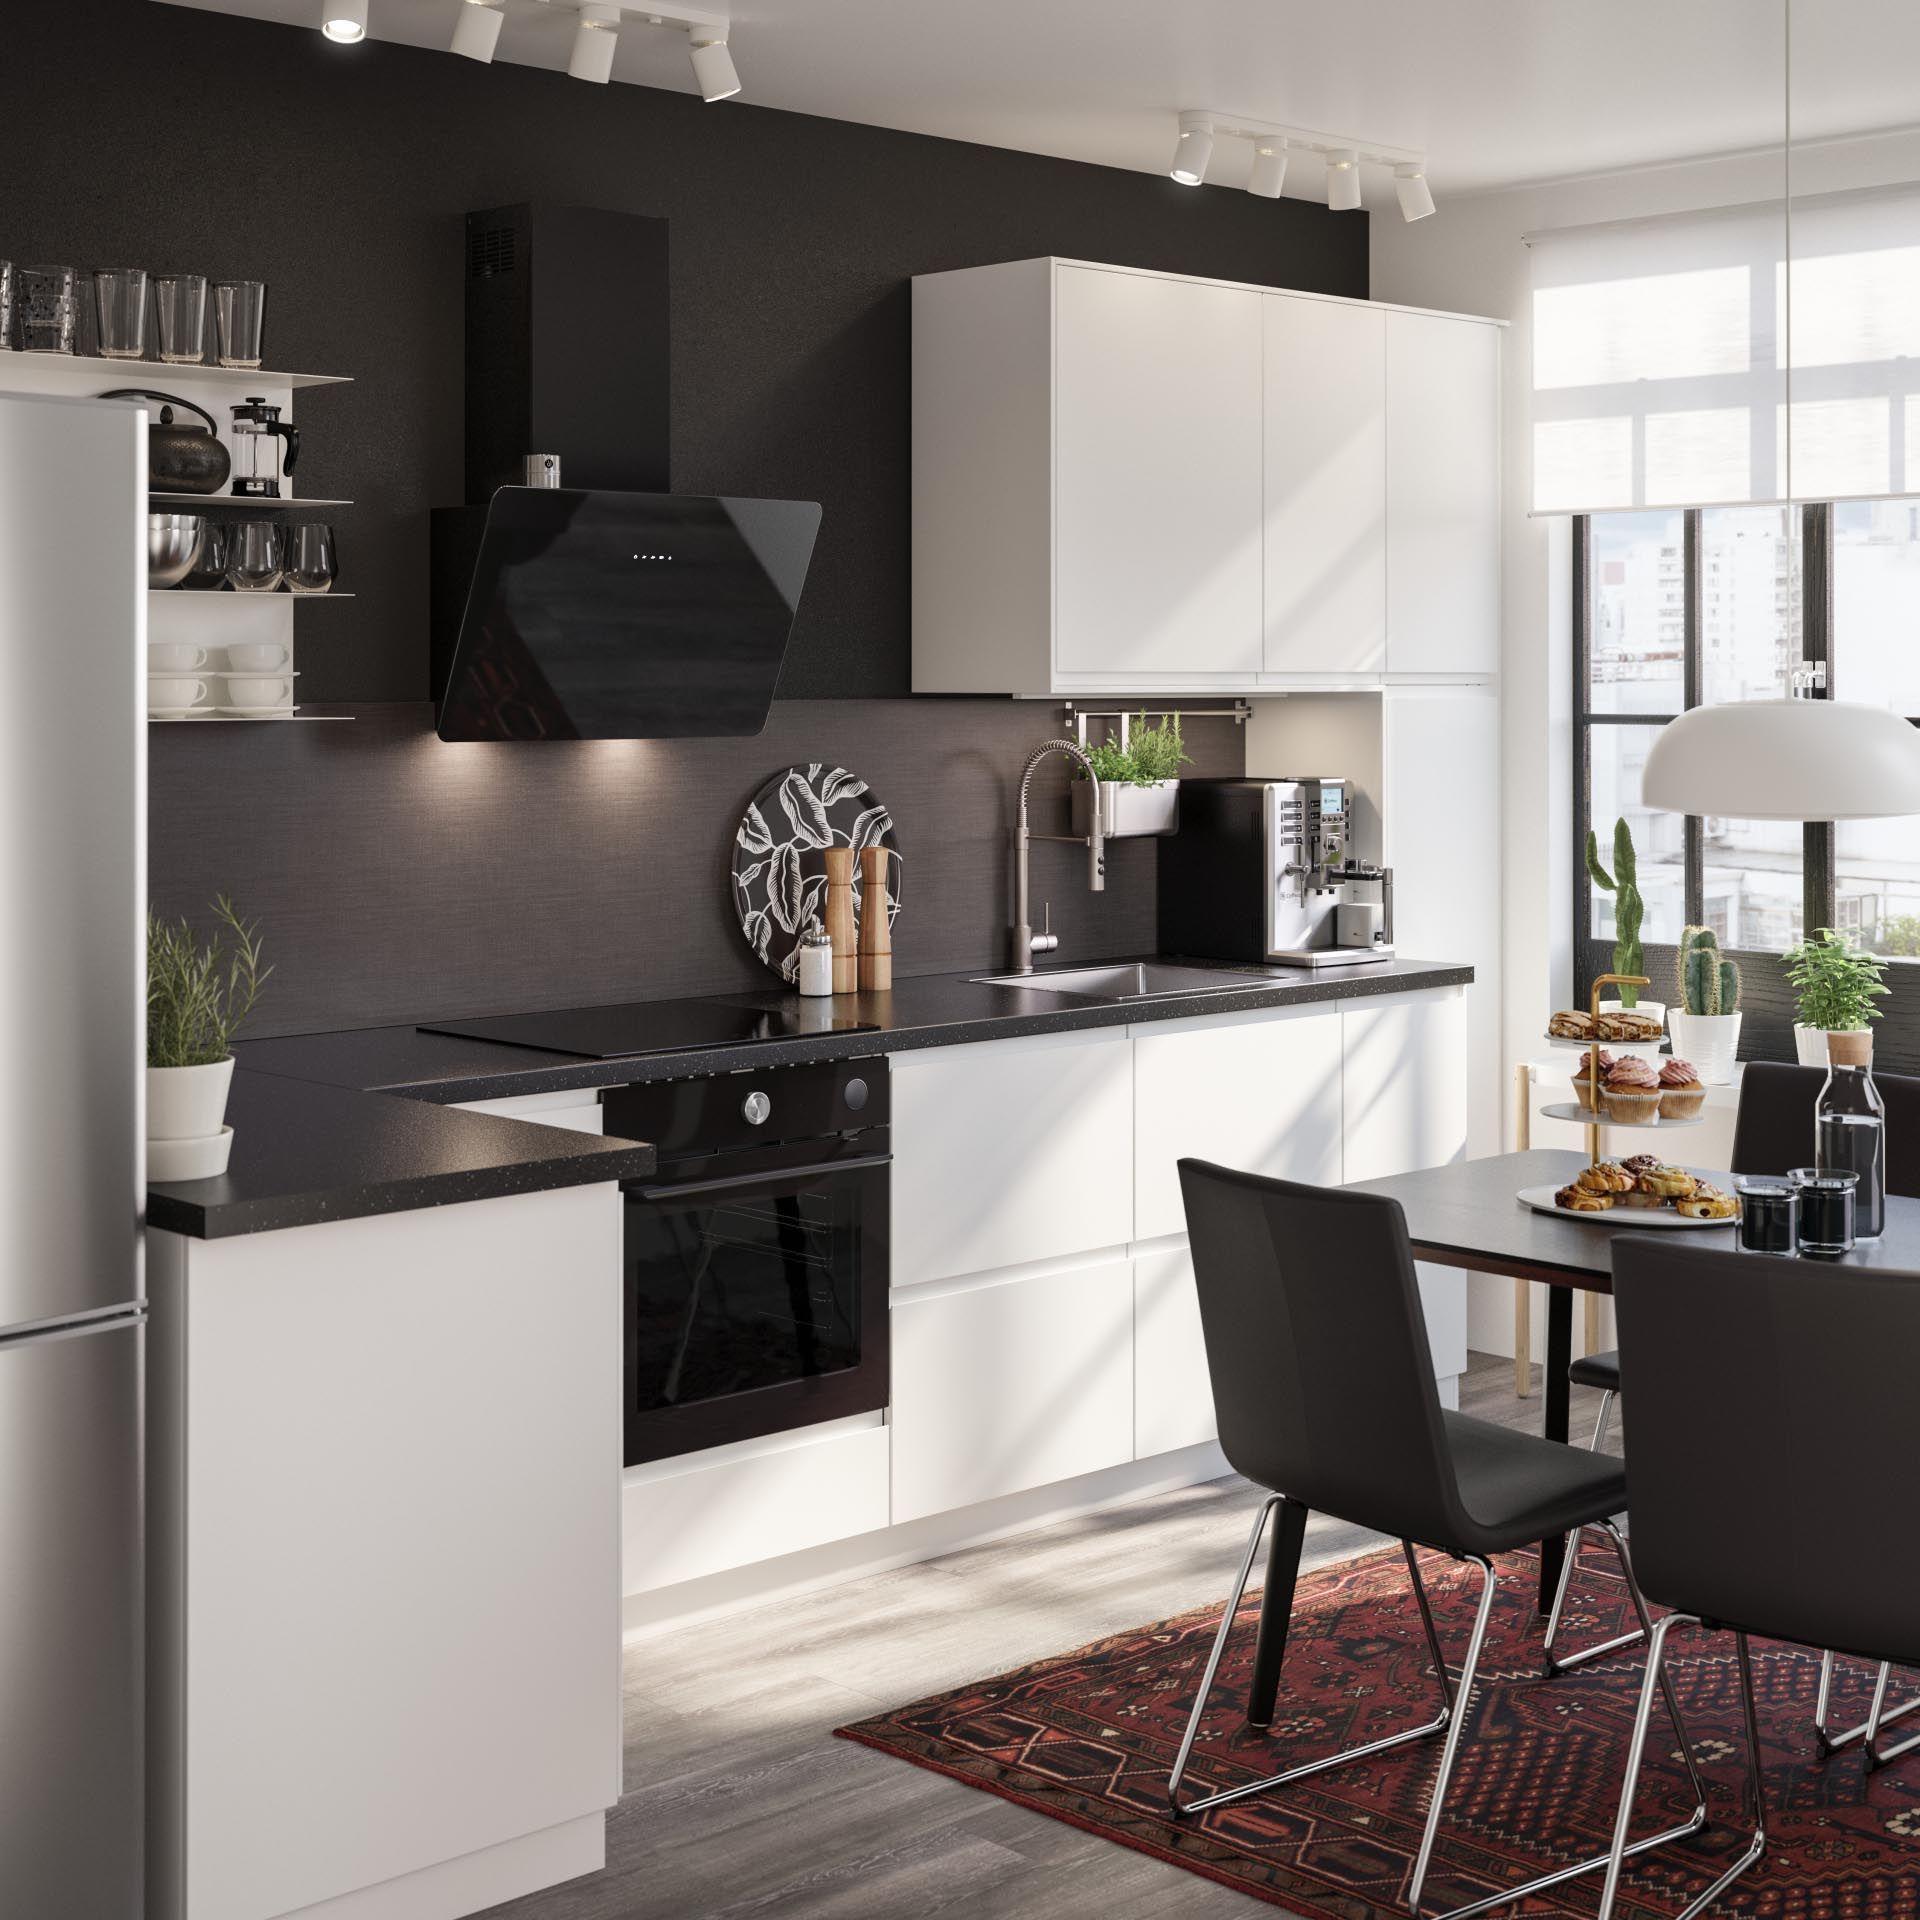 Finsmakare Afzuigkap Wand Zwart Ikea Keuken Idee Keuken Inspiratie Thuisdecoratie